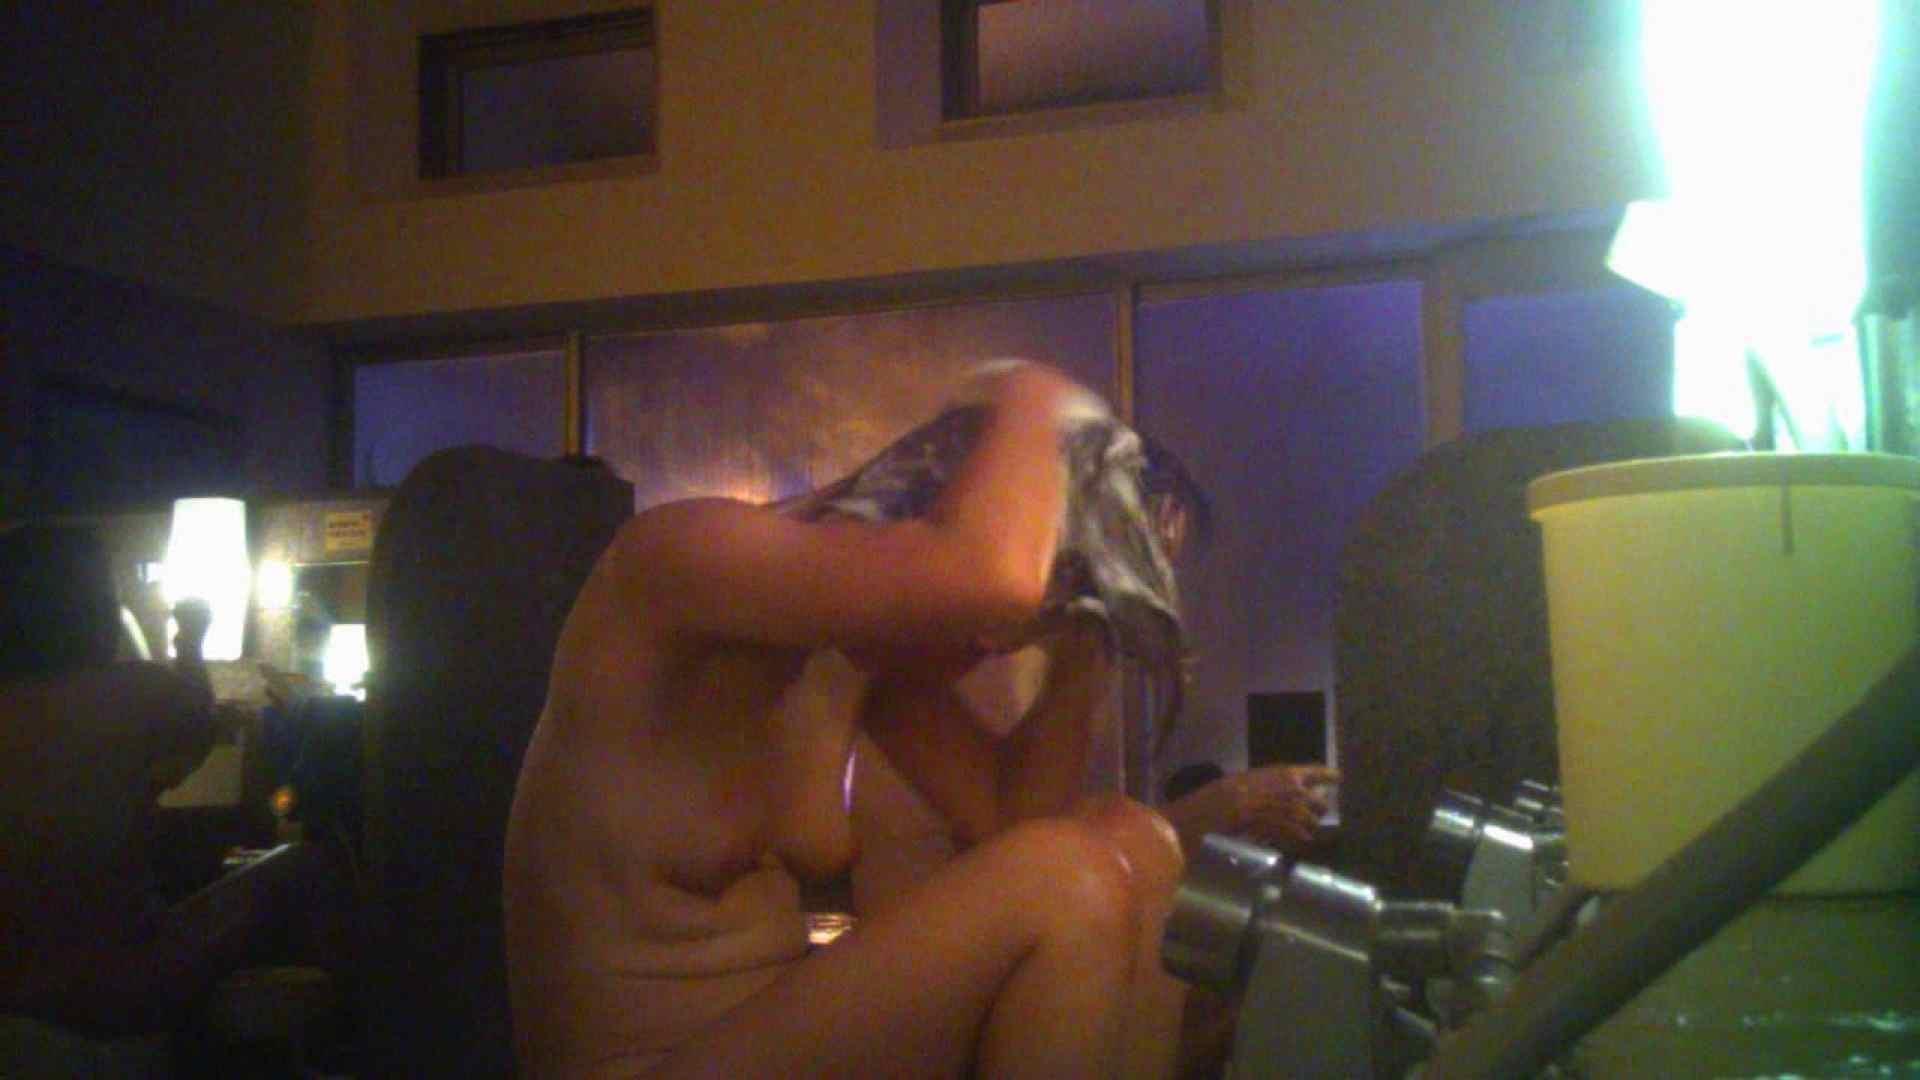 TG.21 【上等兵】井戸端会議が大好きな奥さん アラ40 濡れ場動画紹介 81画像 42